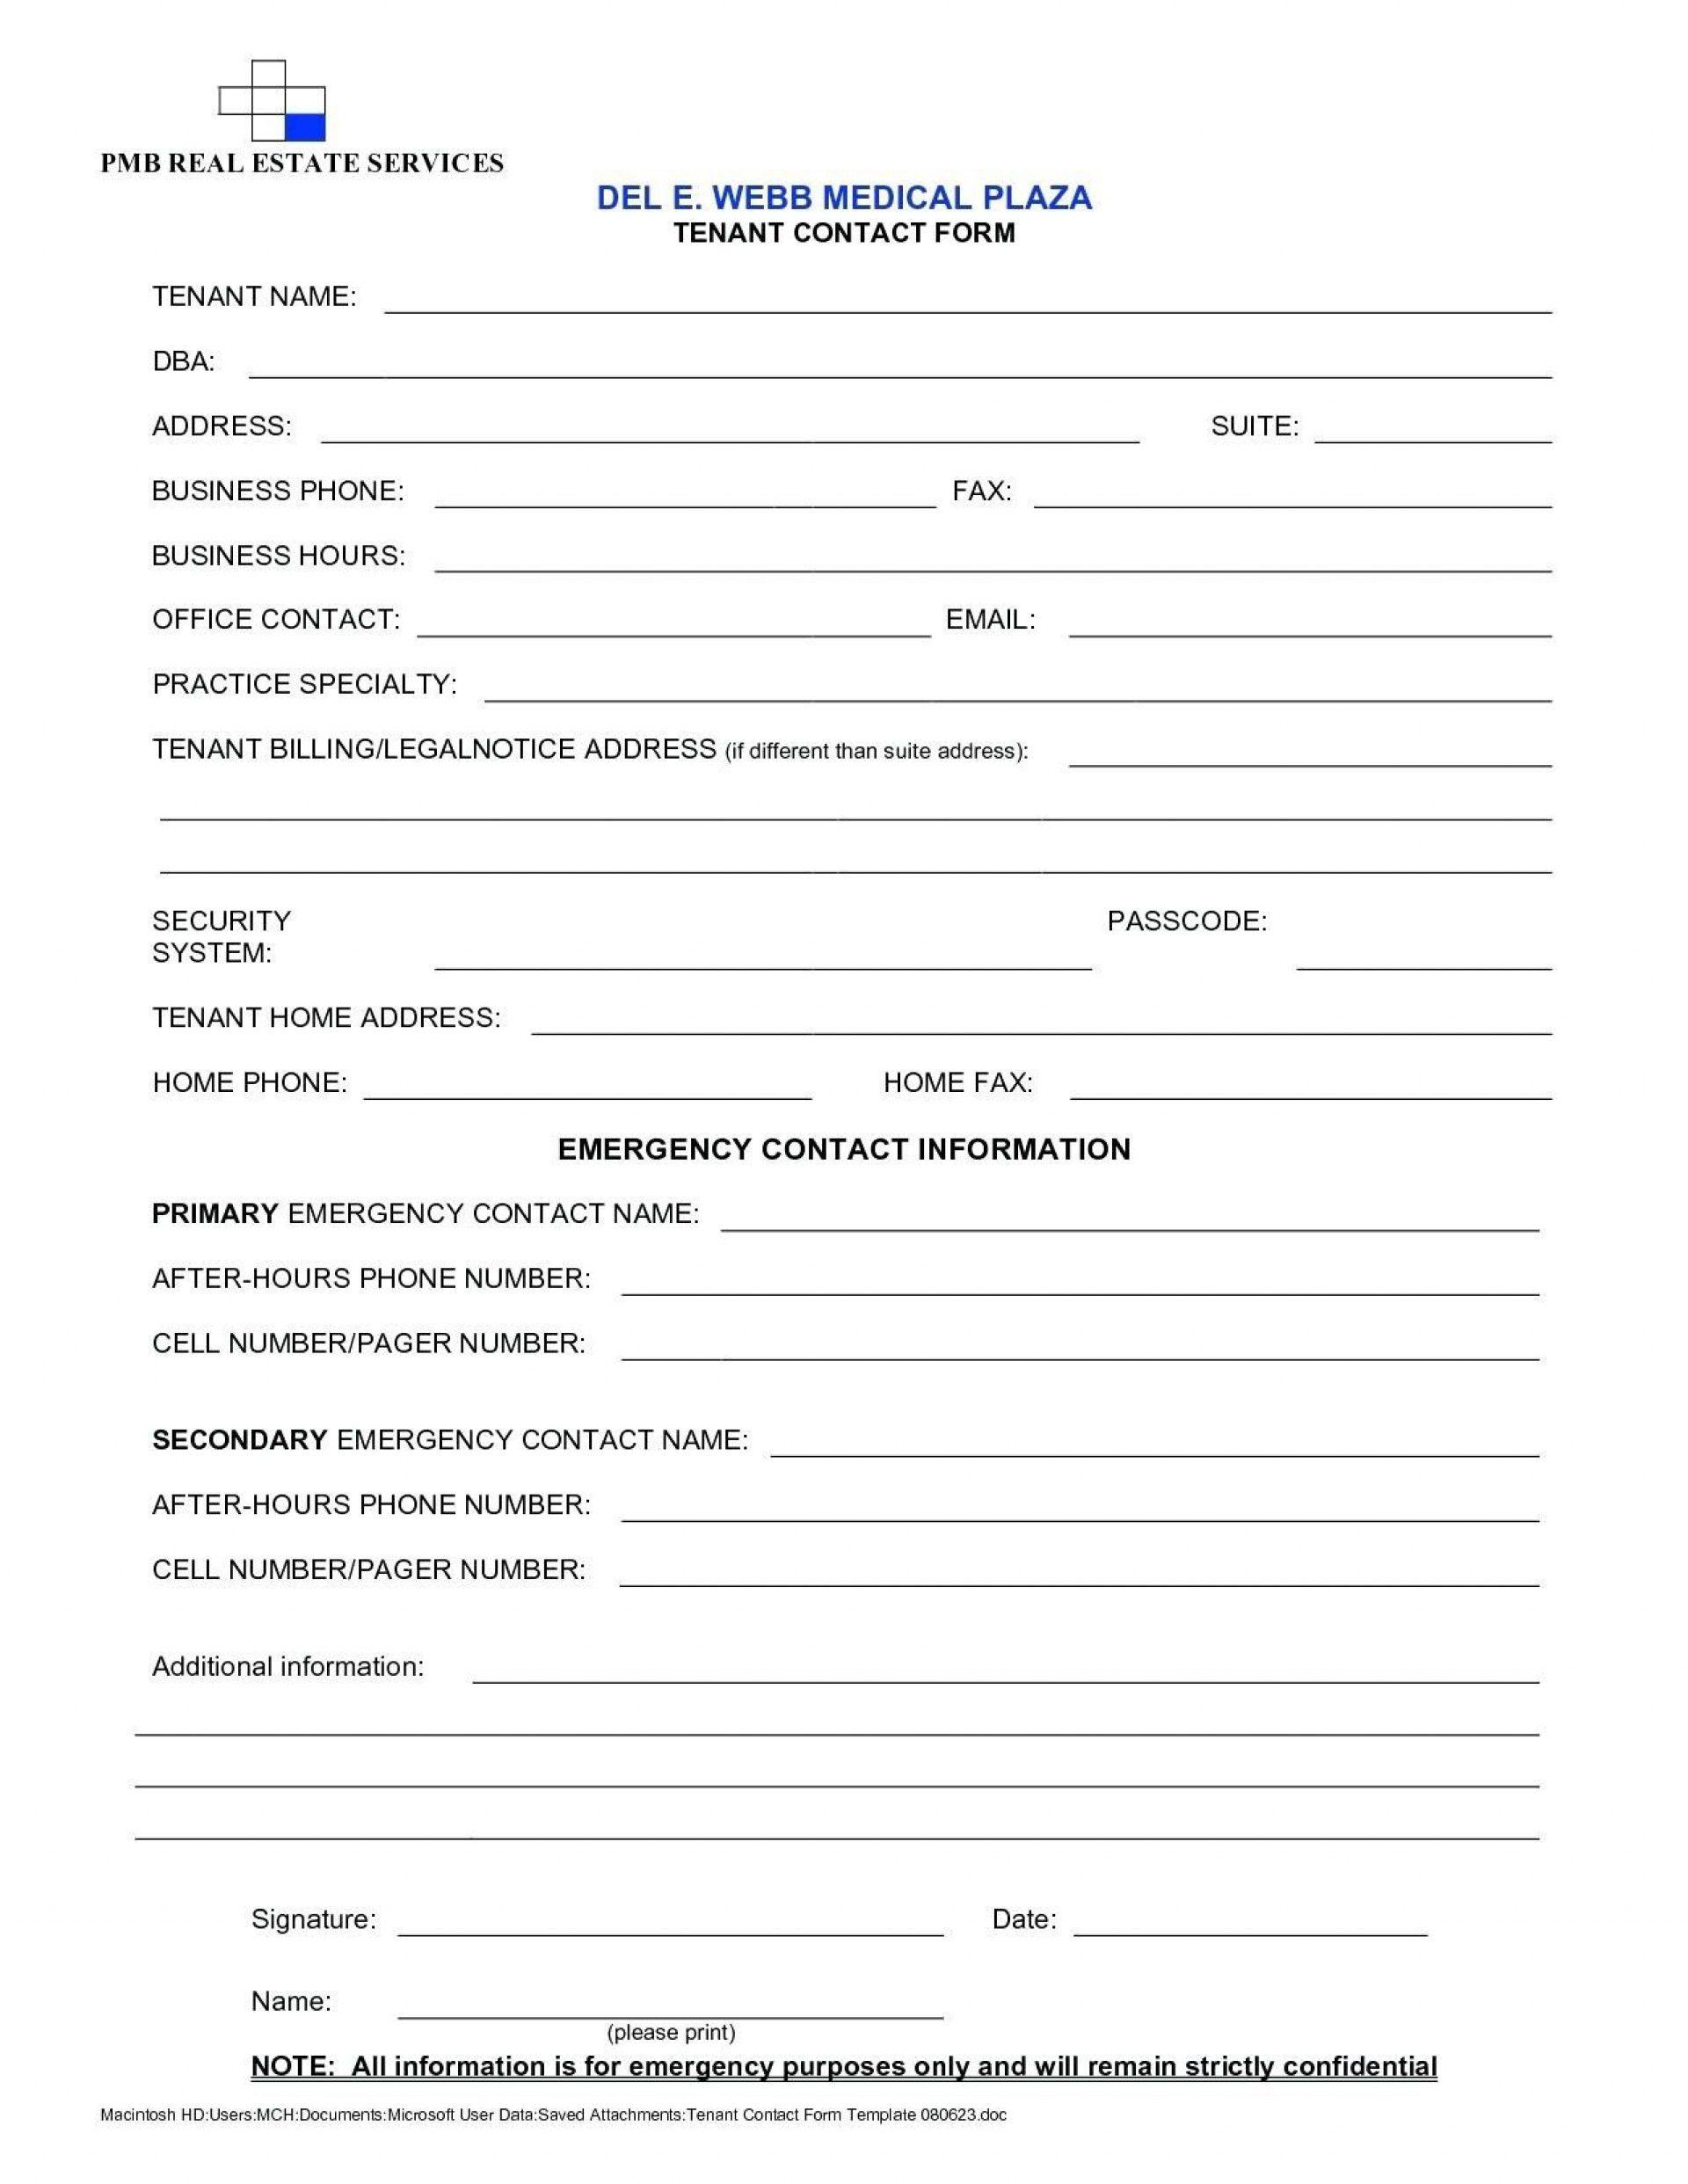 001 Awful New Customer Form Template Word Highest Quality  Registration Account FeedbackFull